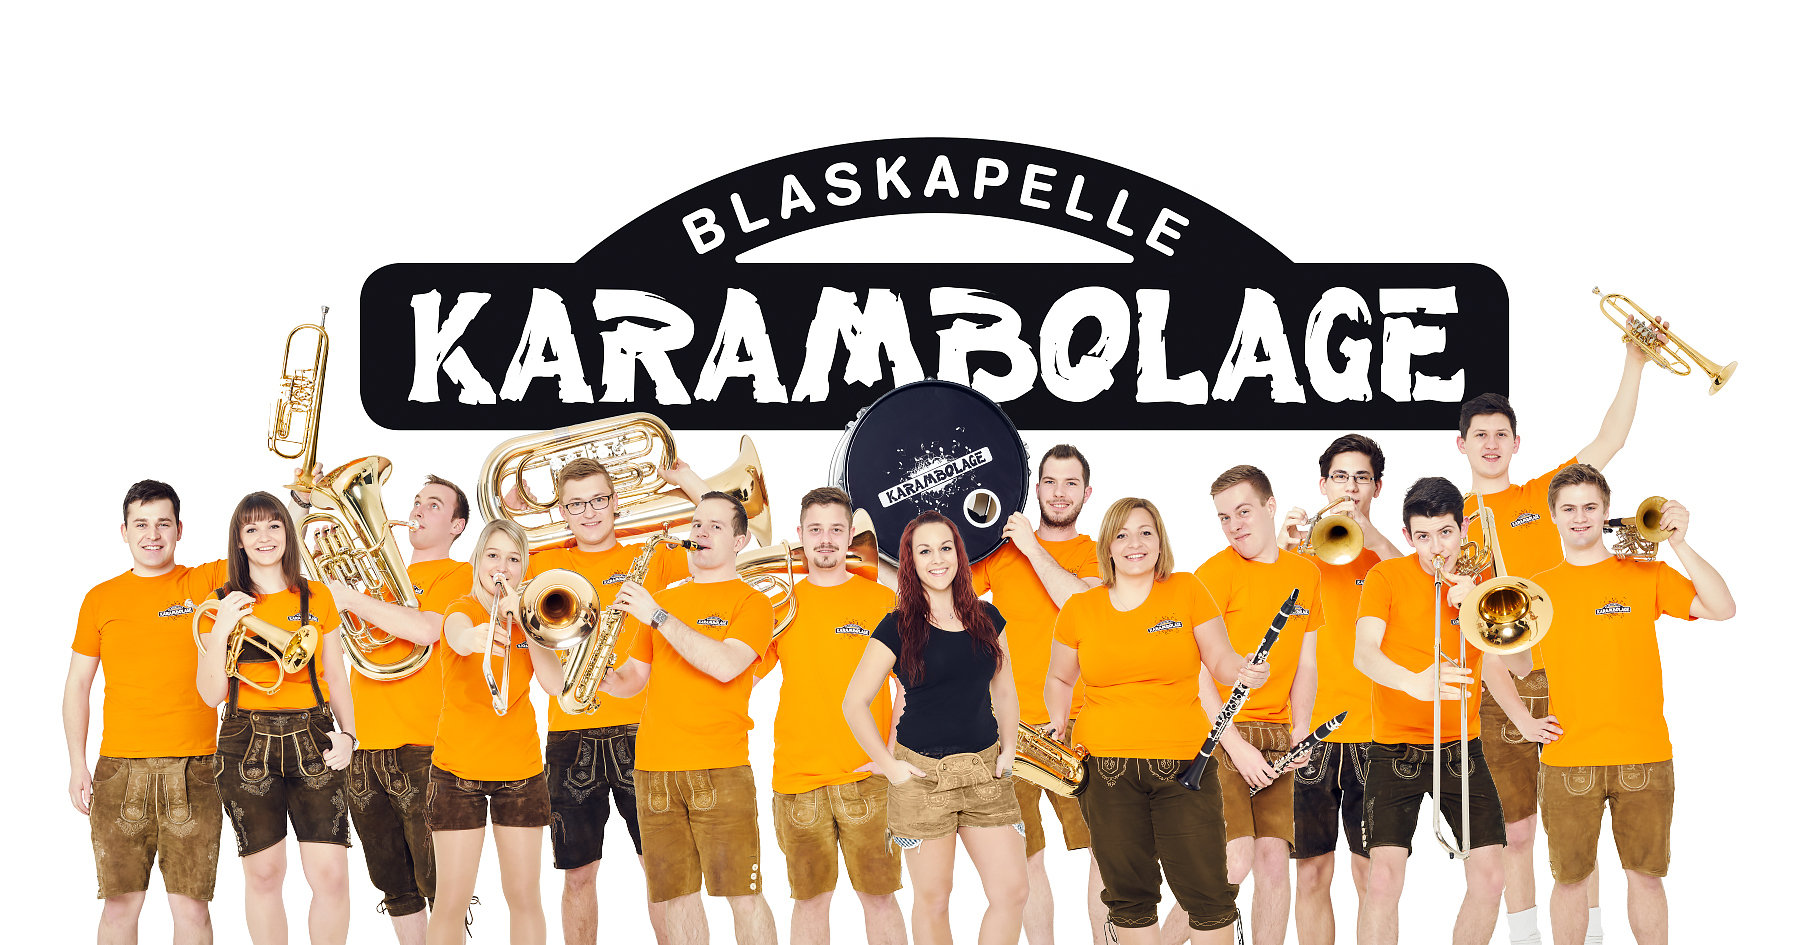 Blaskapelle Karambolage